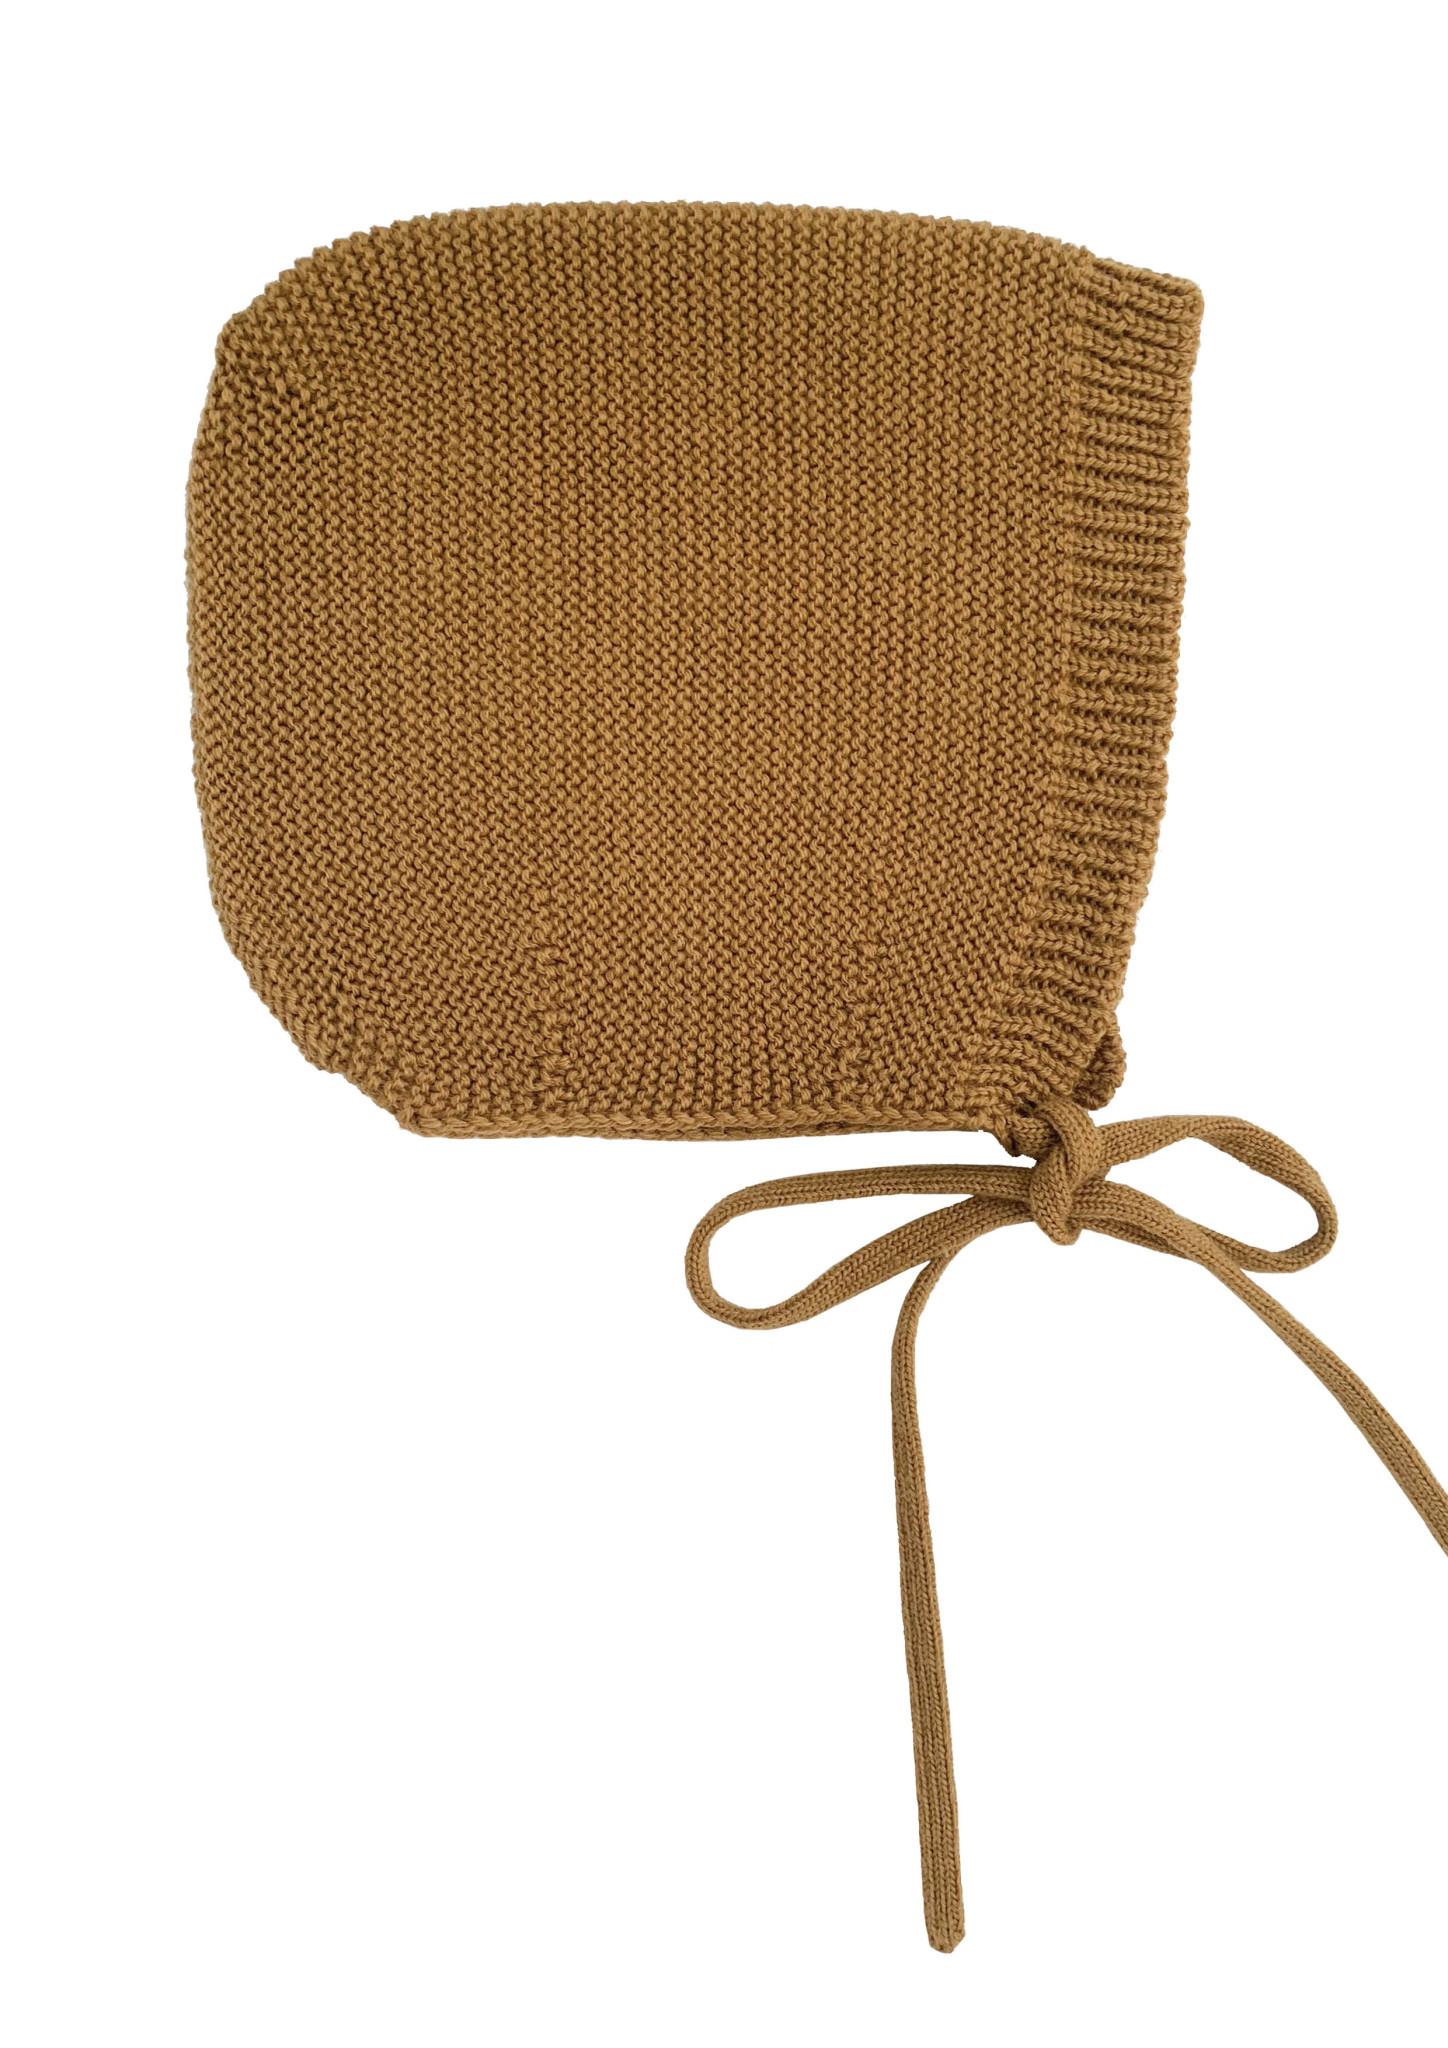 Bonnet dolly mustard-2